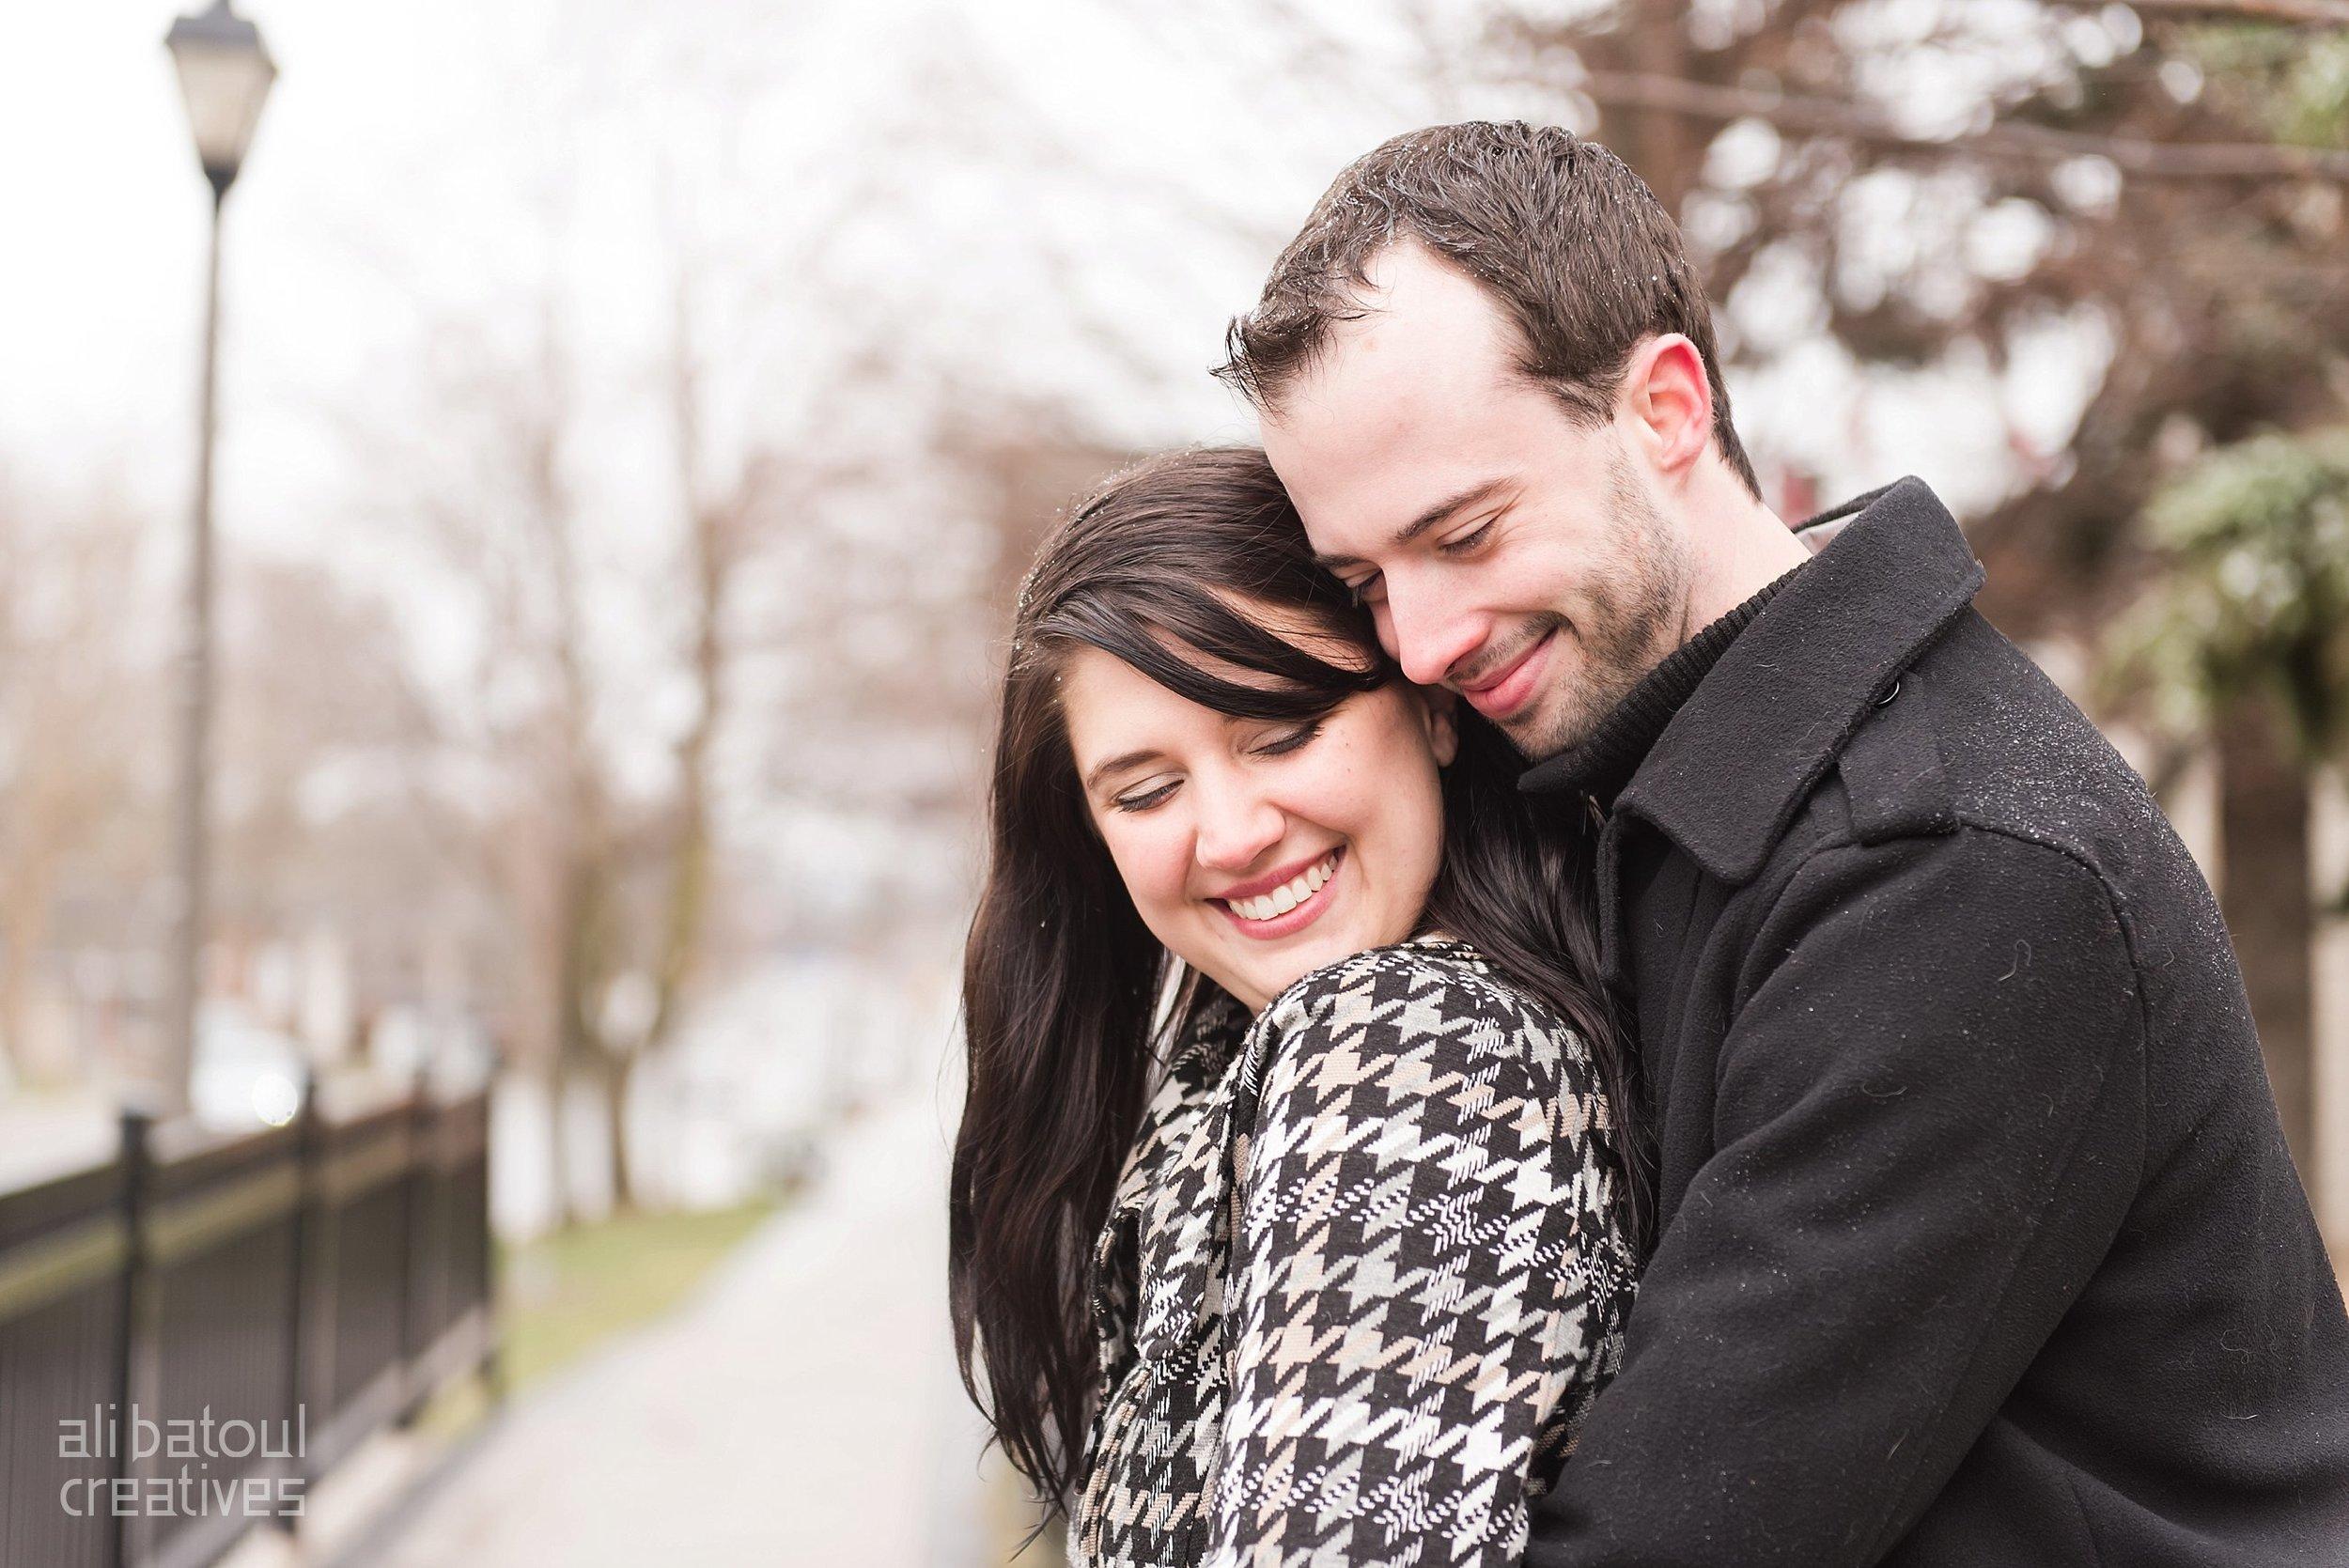 Ottawa Wedding Photography - Ali Batoul Creatives_0029.jpg